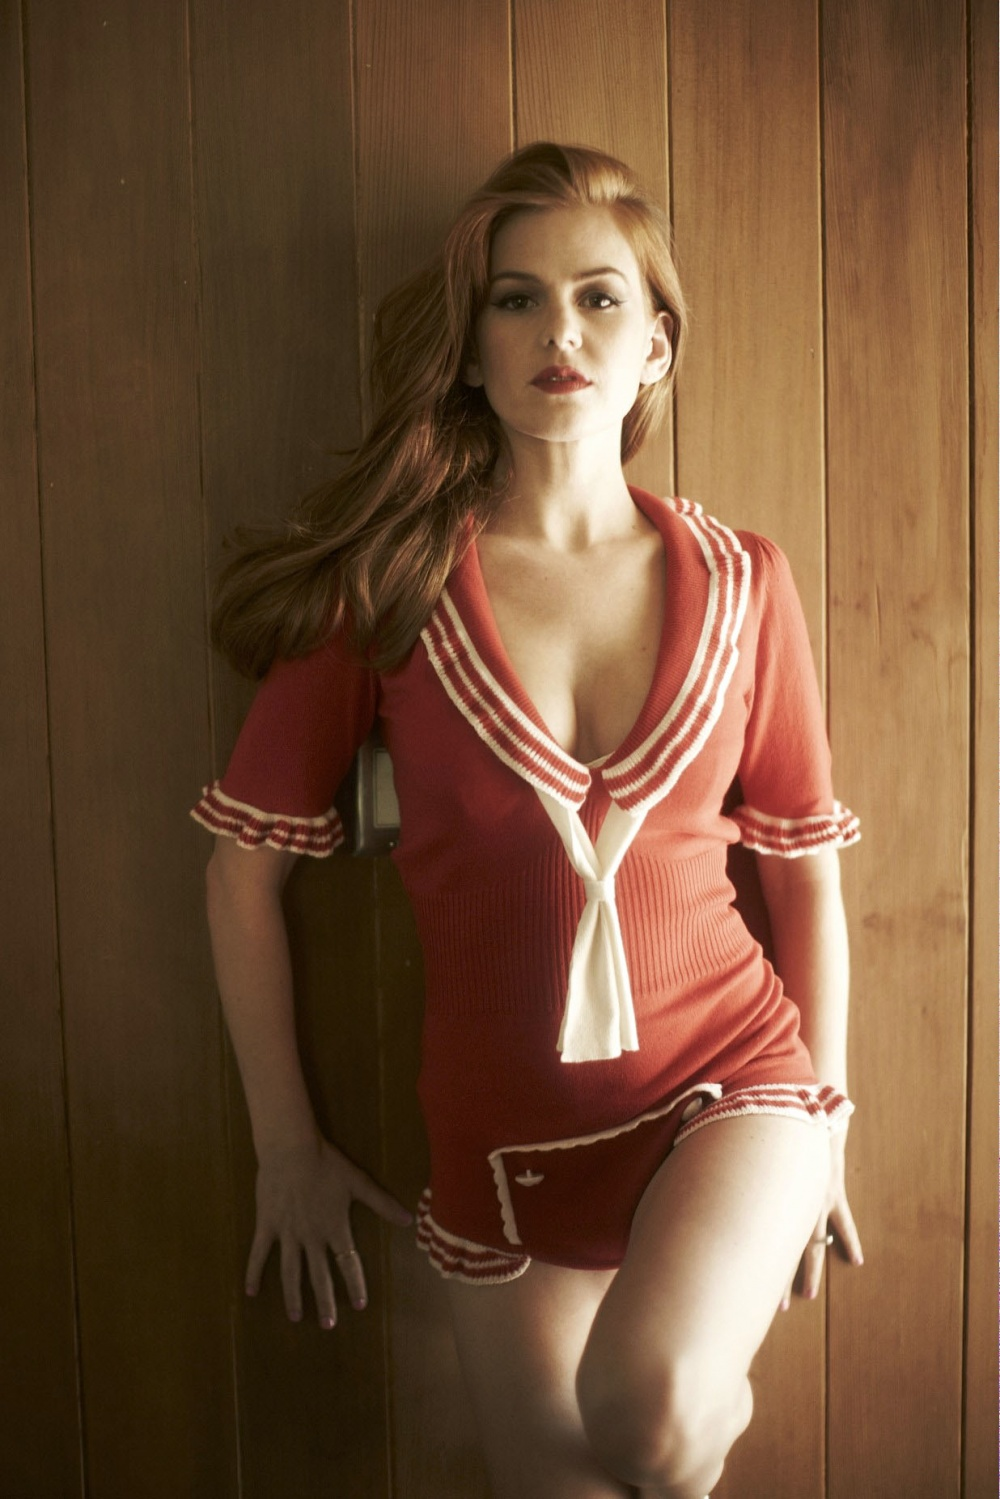 Айла Фишер (Isla Fisher)